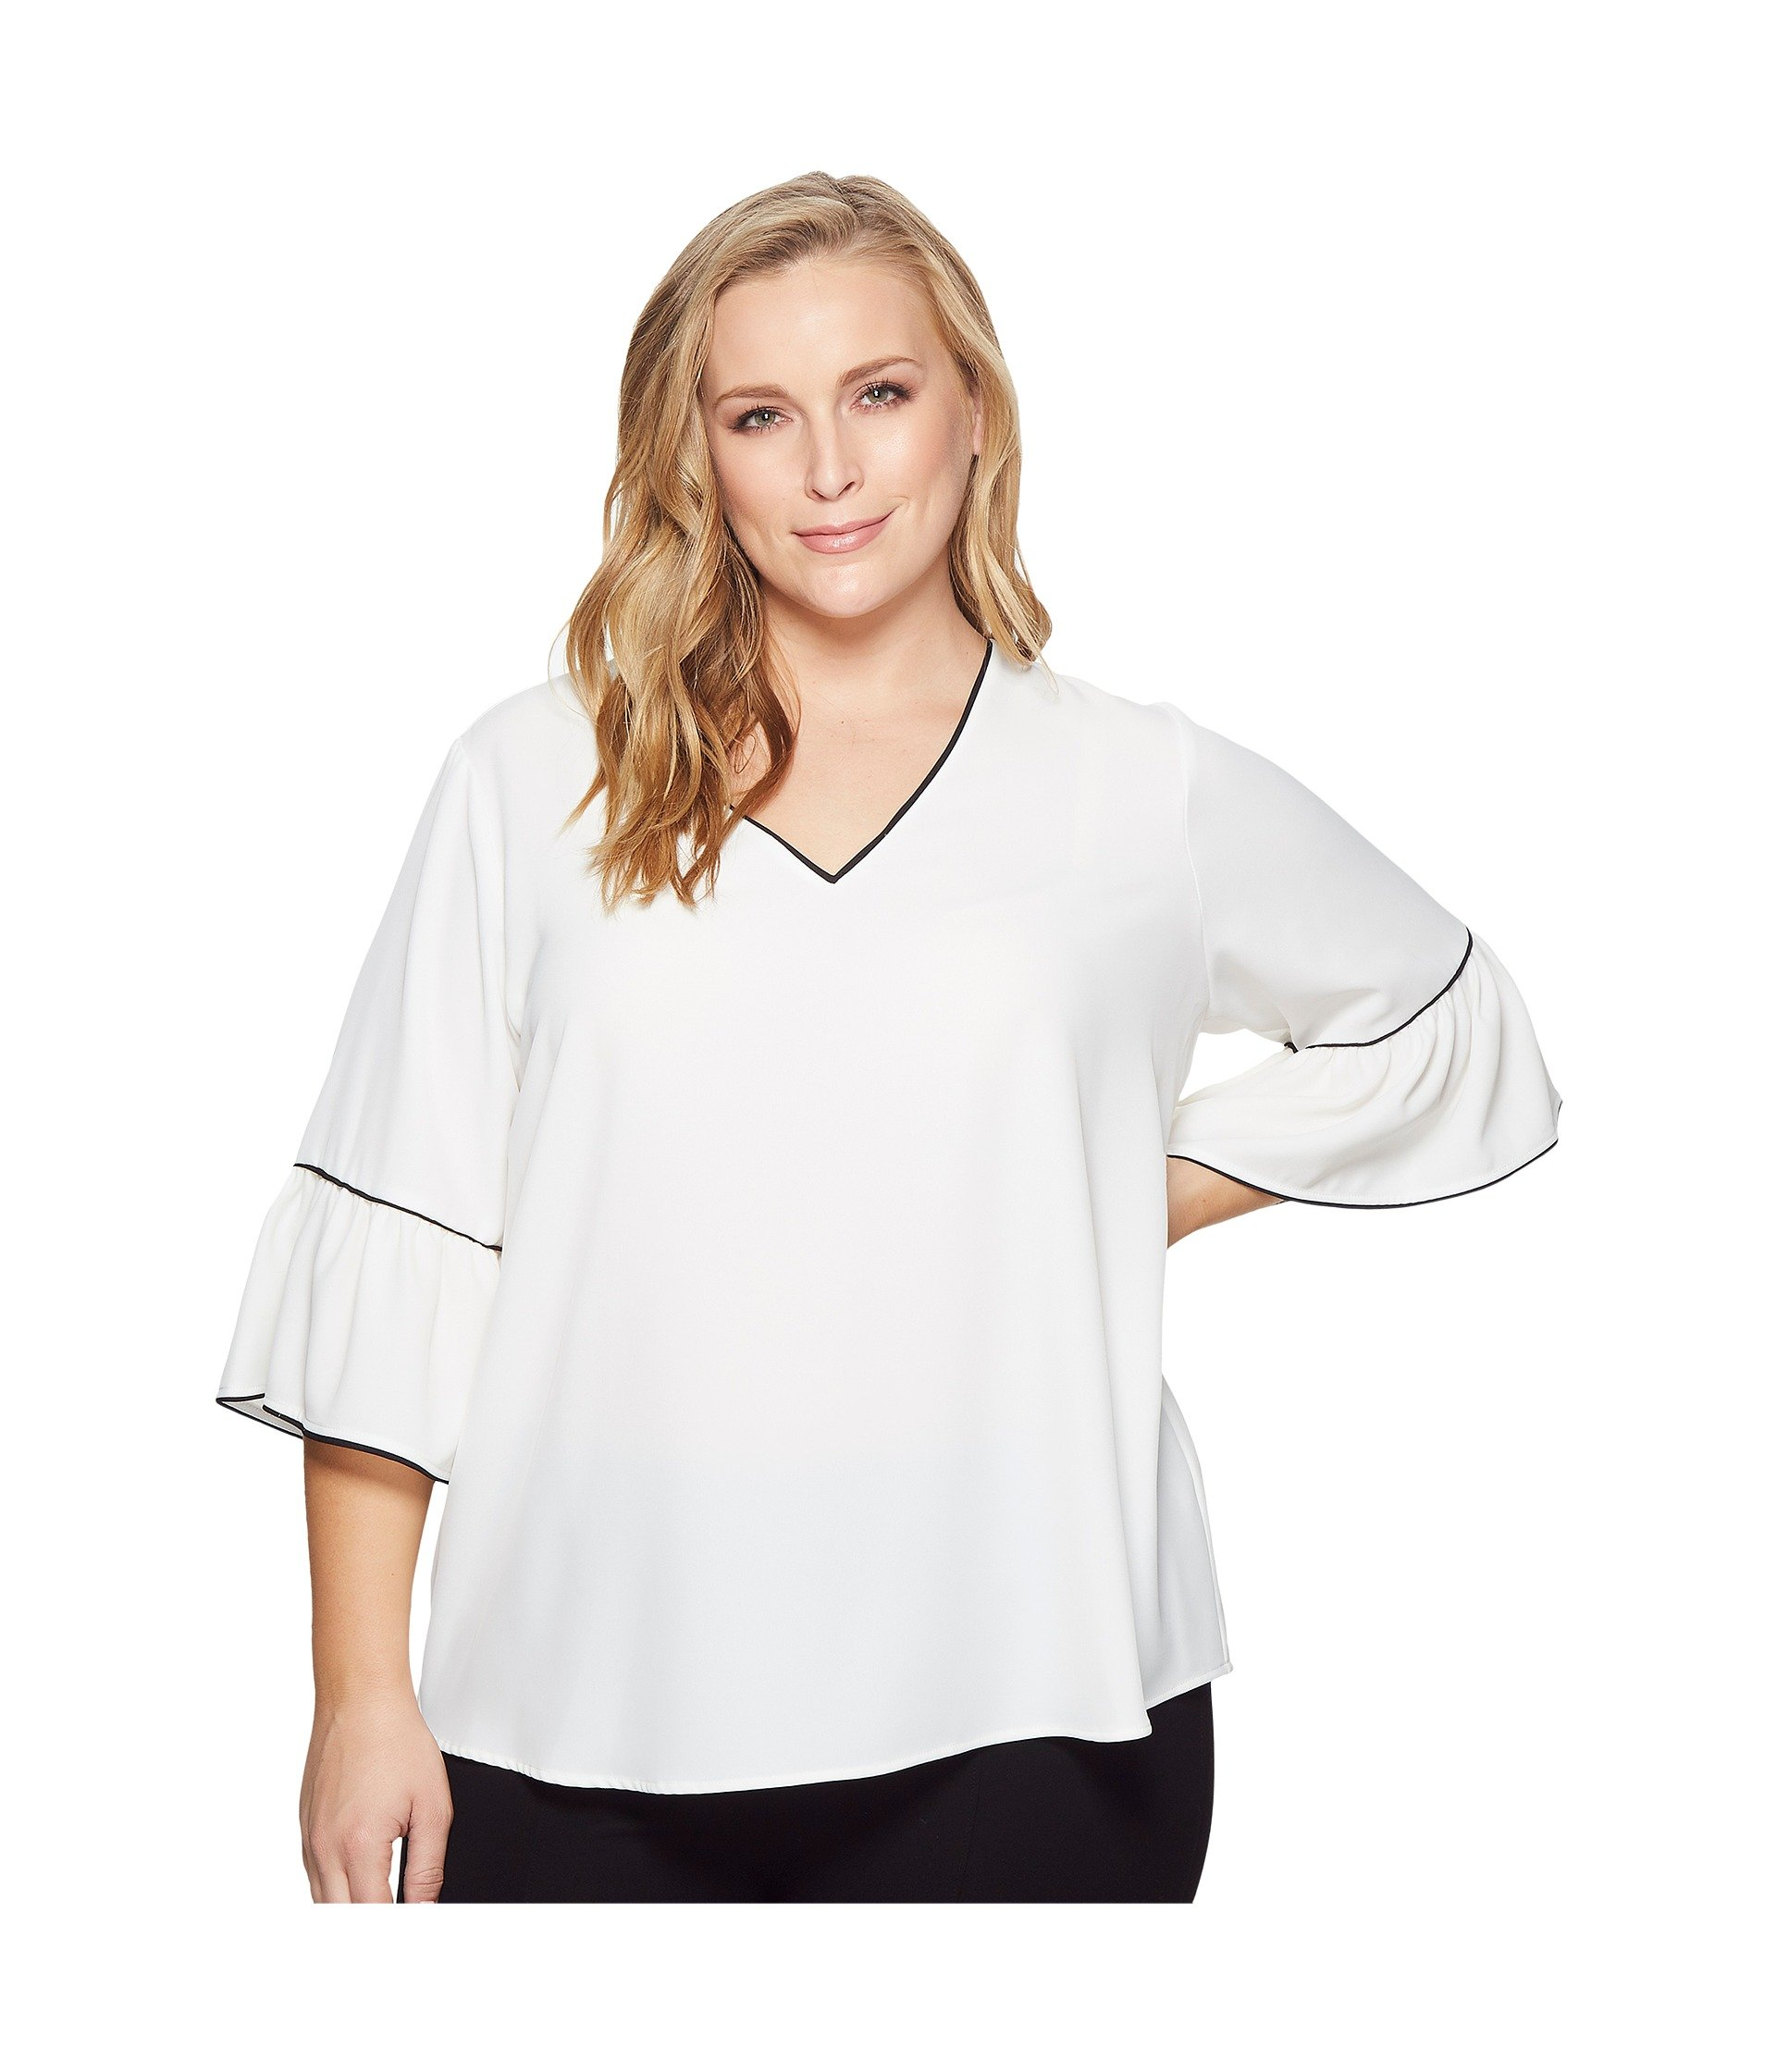 Pirate Shirts Plus Size Lauren Goss